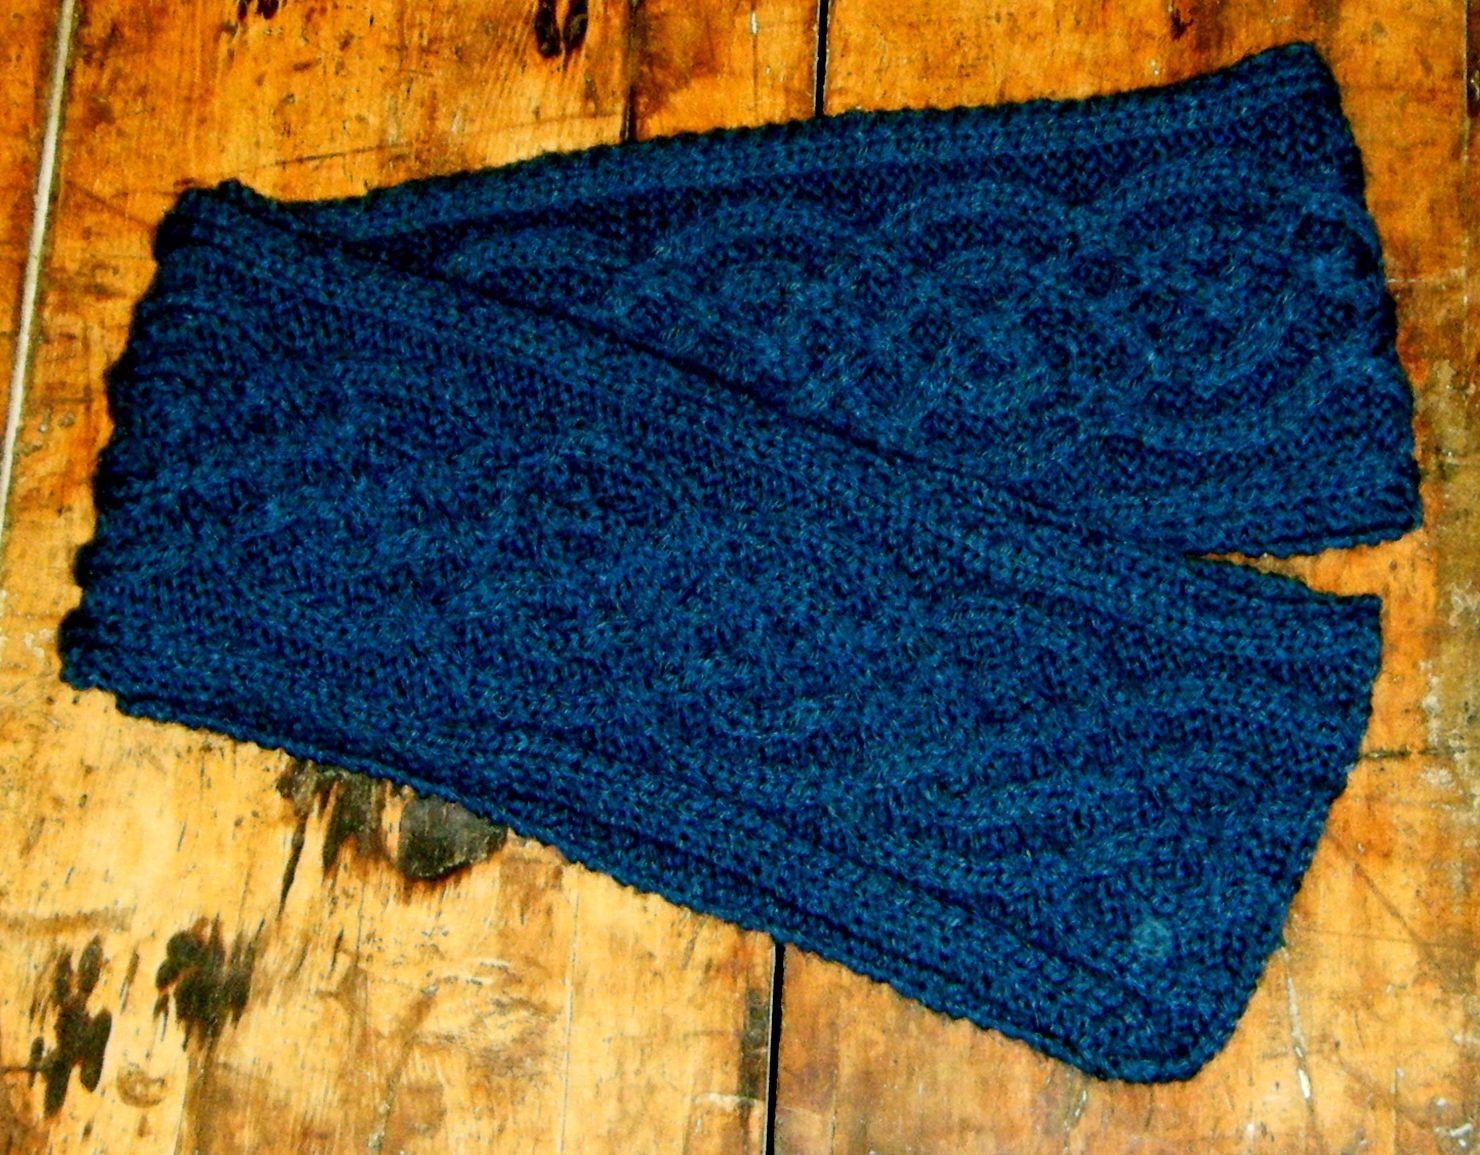 Deep Blue Celtic Knot Hand Knitted Scarf   Knitting & Crochet ...